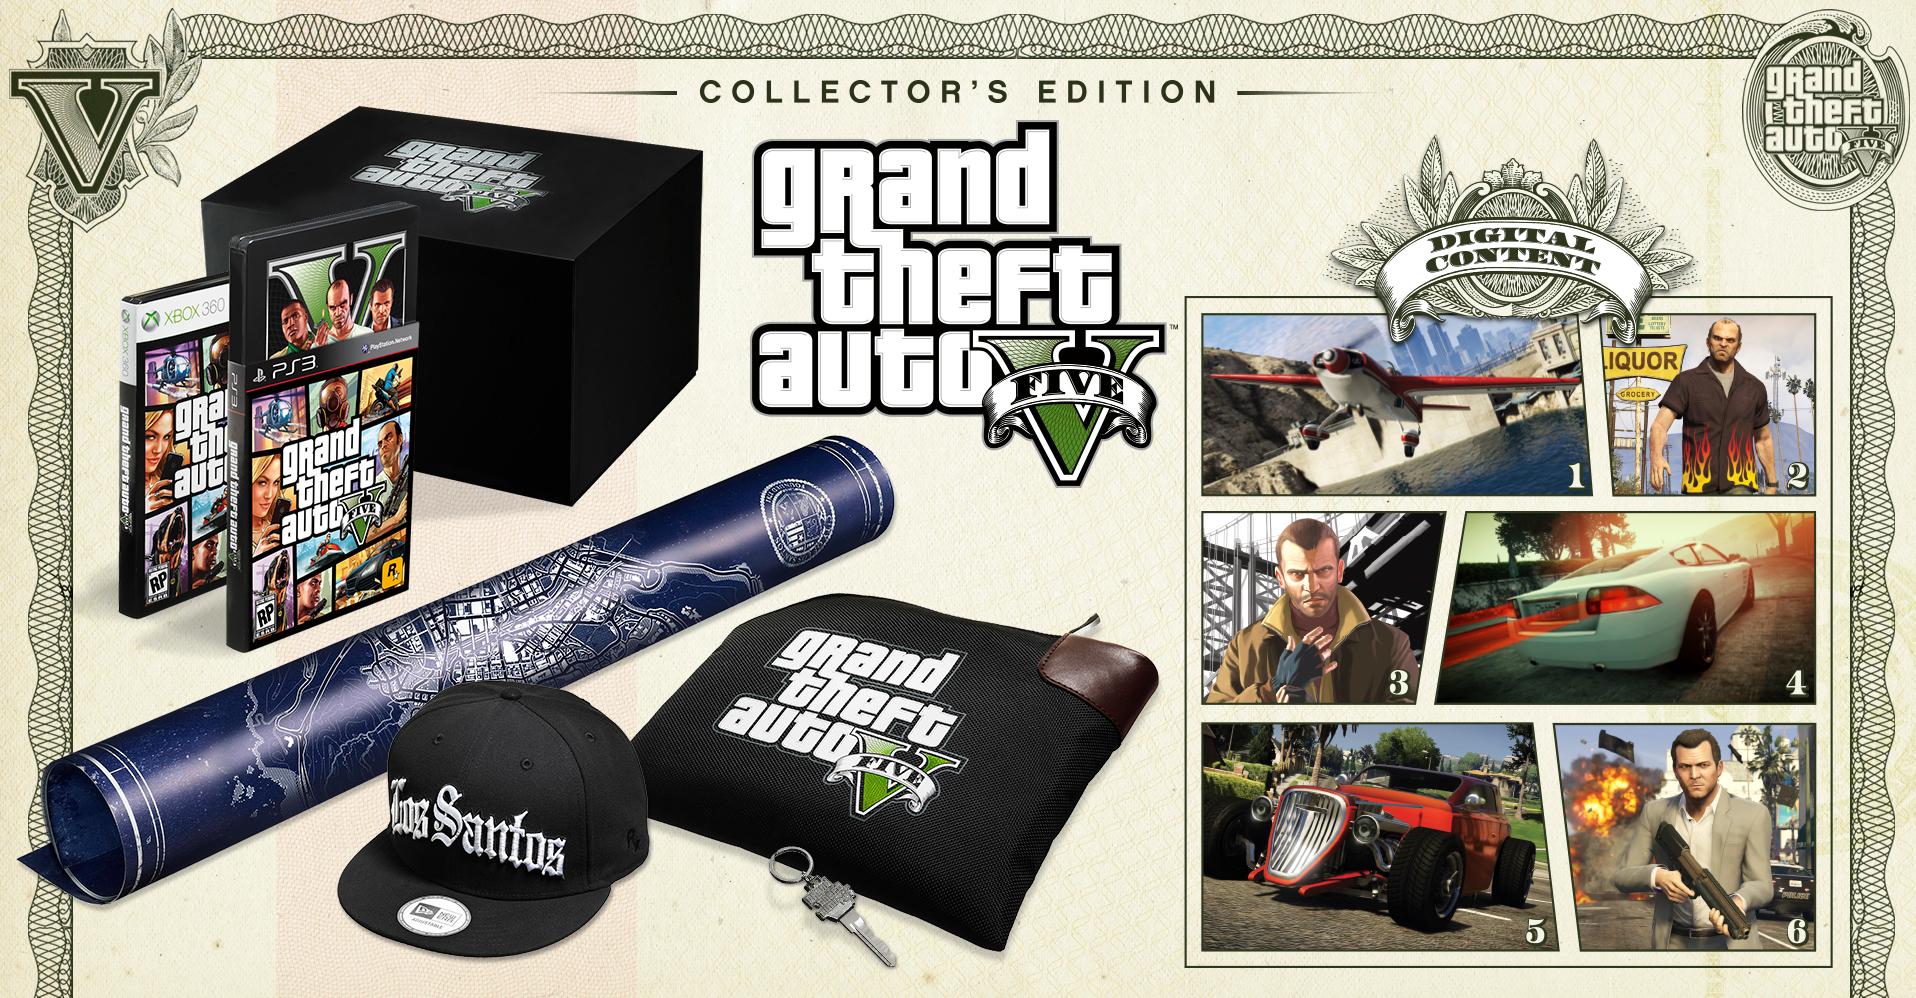 Xbox One Collectors Edition Gta v collectors edition pic